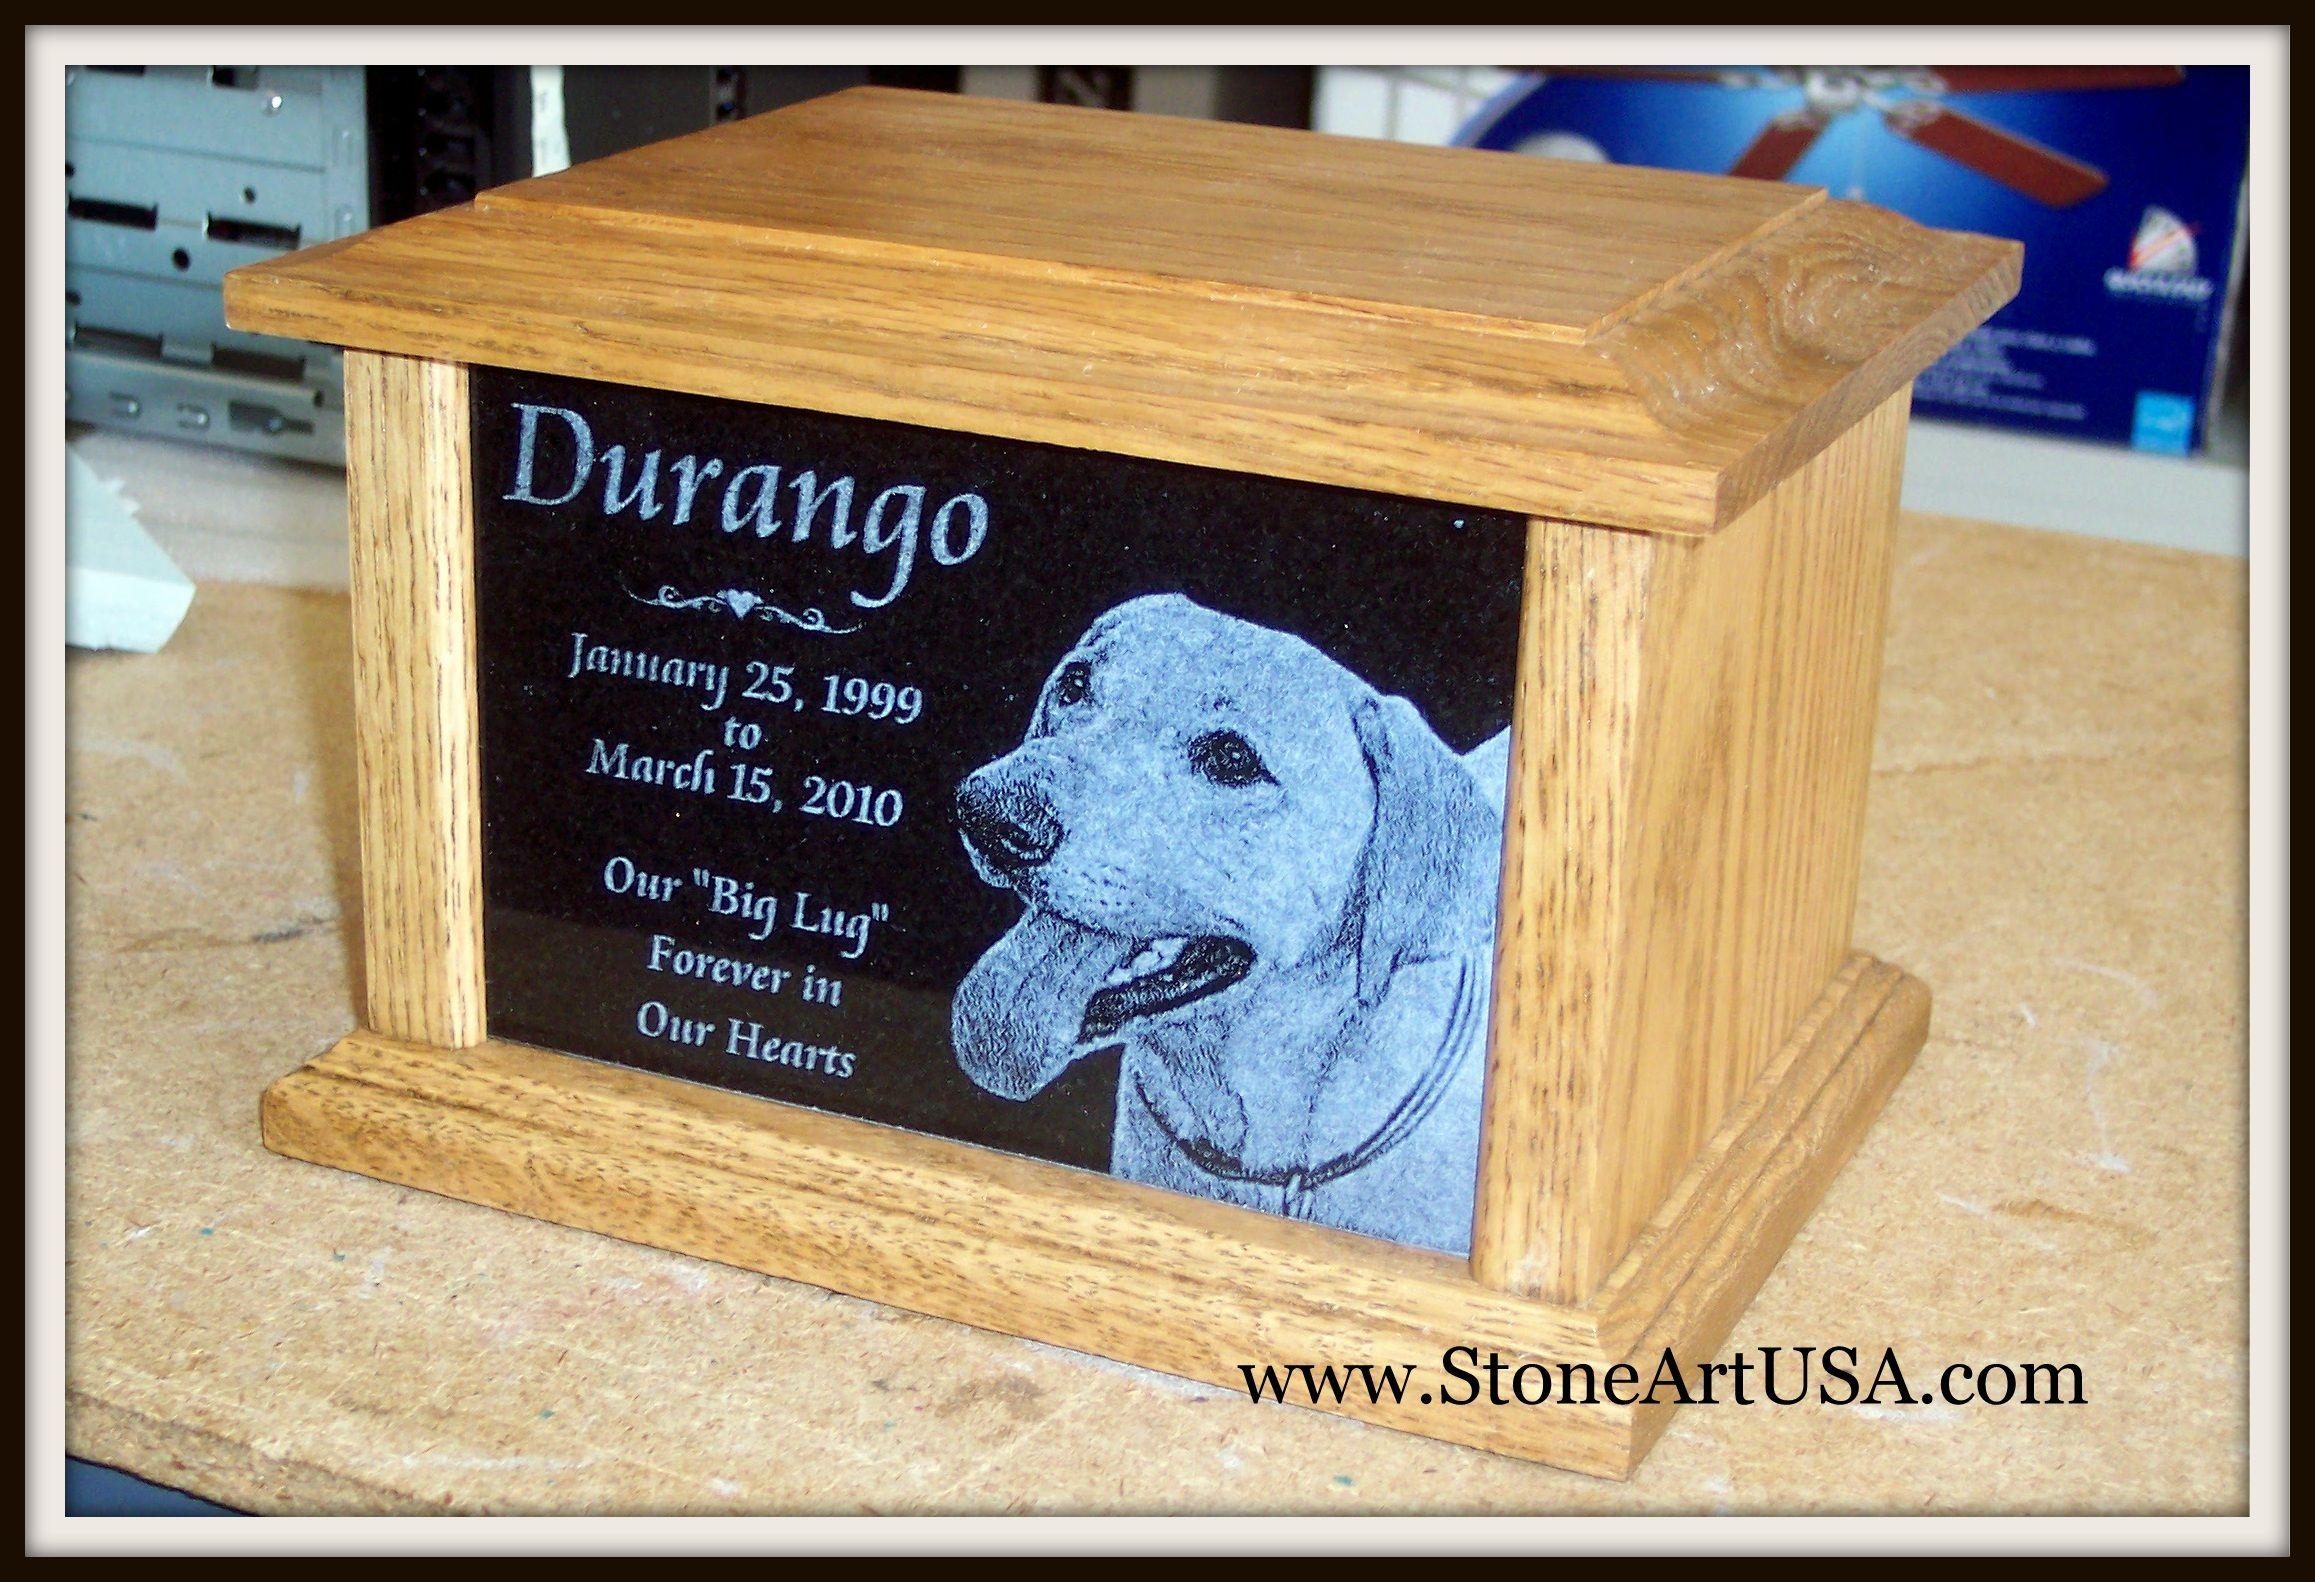 R.I.P. Durango New Ideas for Pet Grave Stones